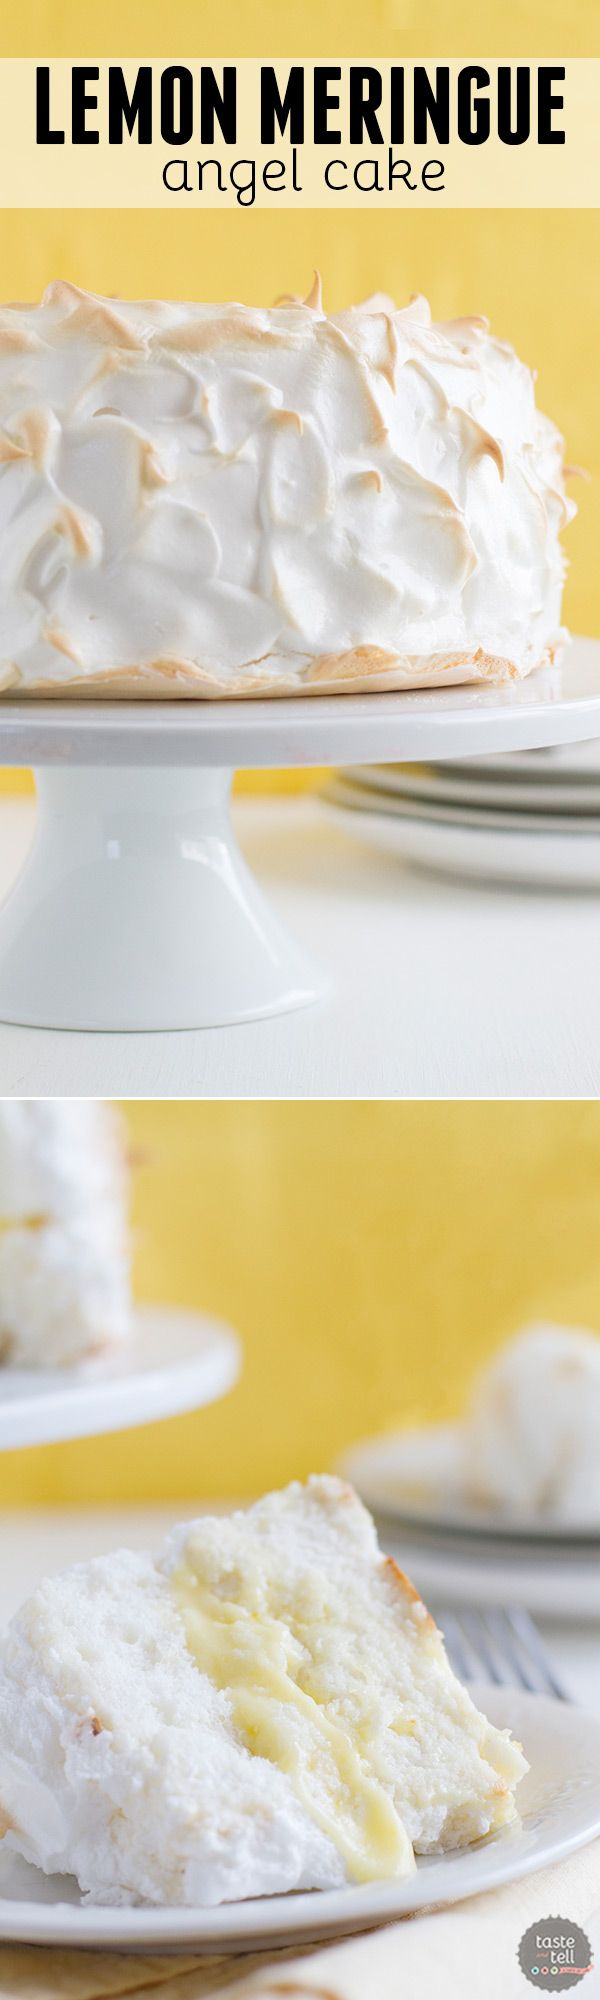 Love angel food cake and lemon meringue pie? This Lemon Meringue Angel Cake combines the best of both for an impressive dessert!